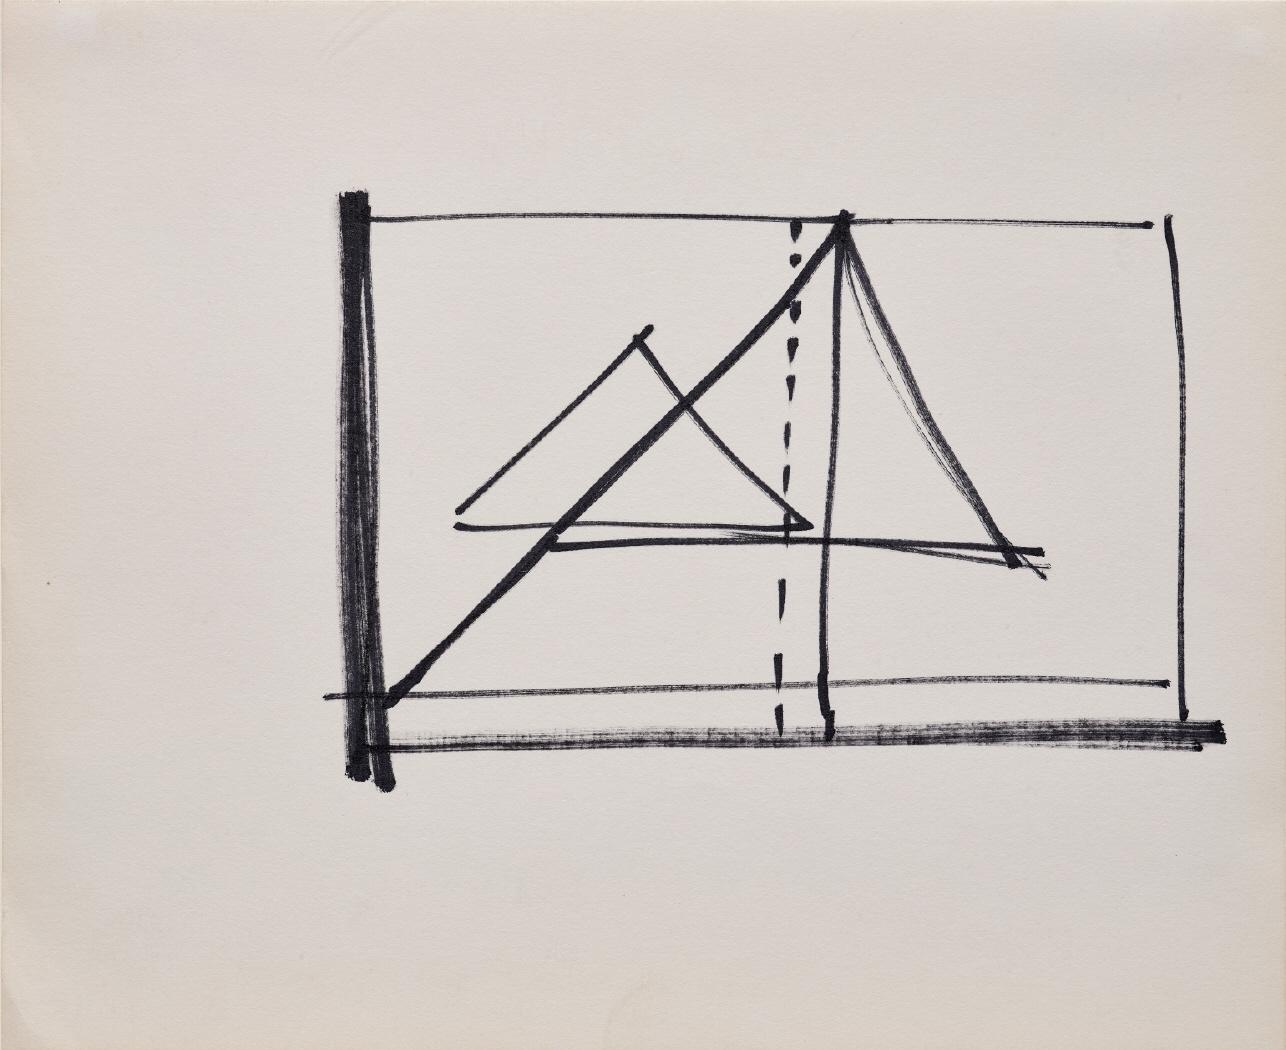 Studies for Cut Drawings (Notebook), 1974